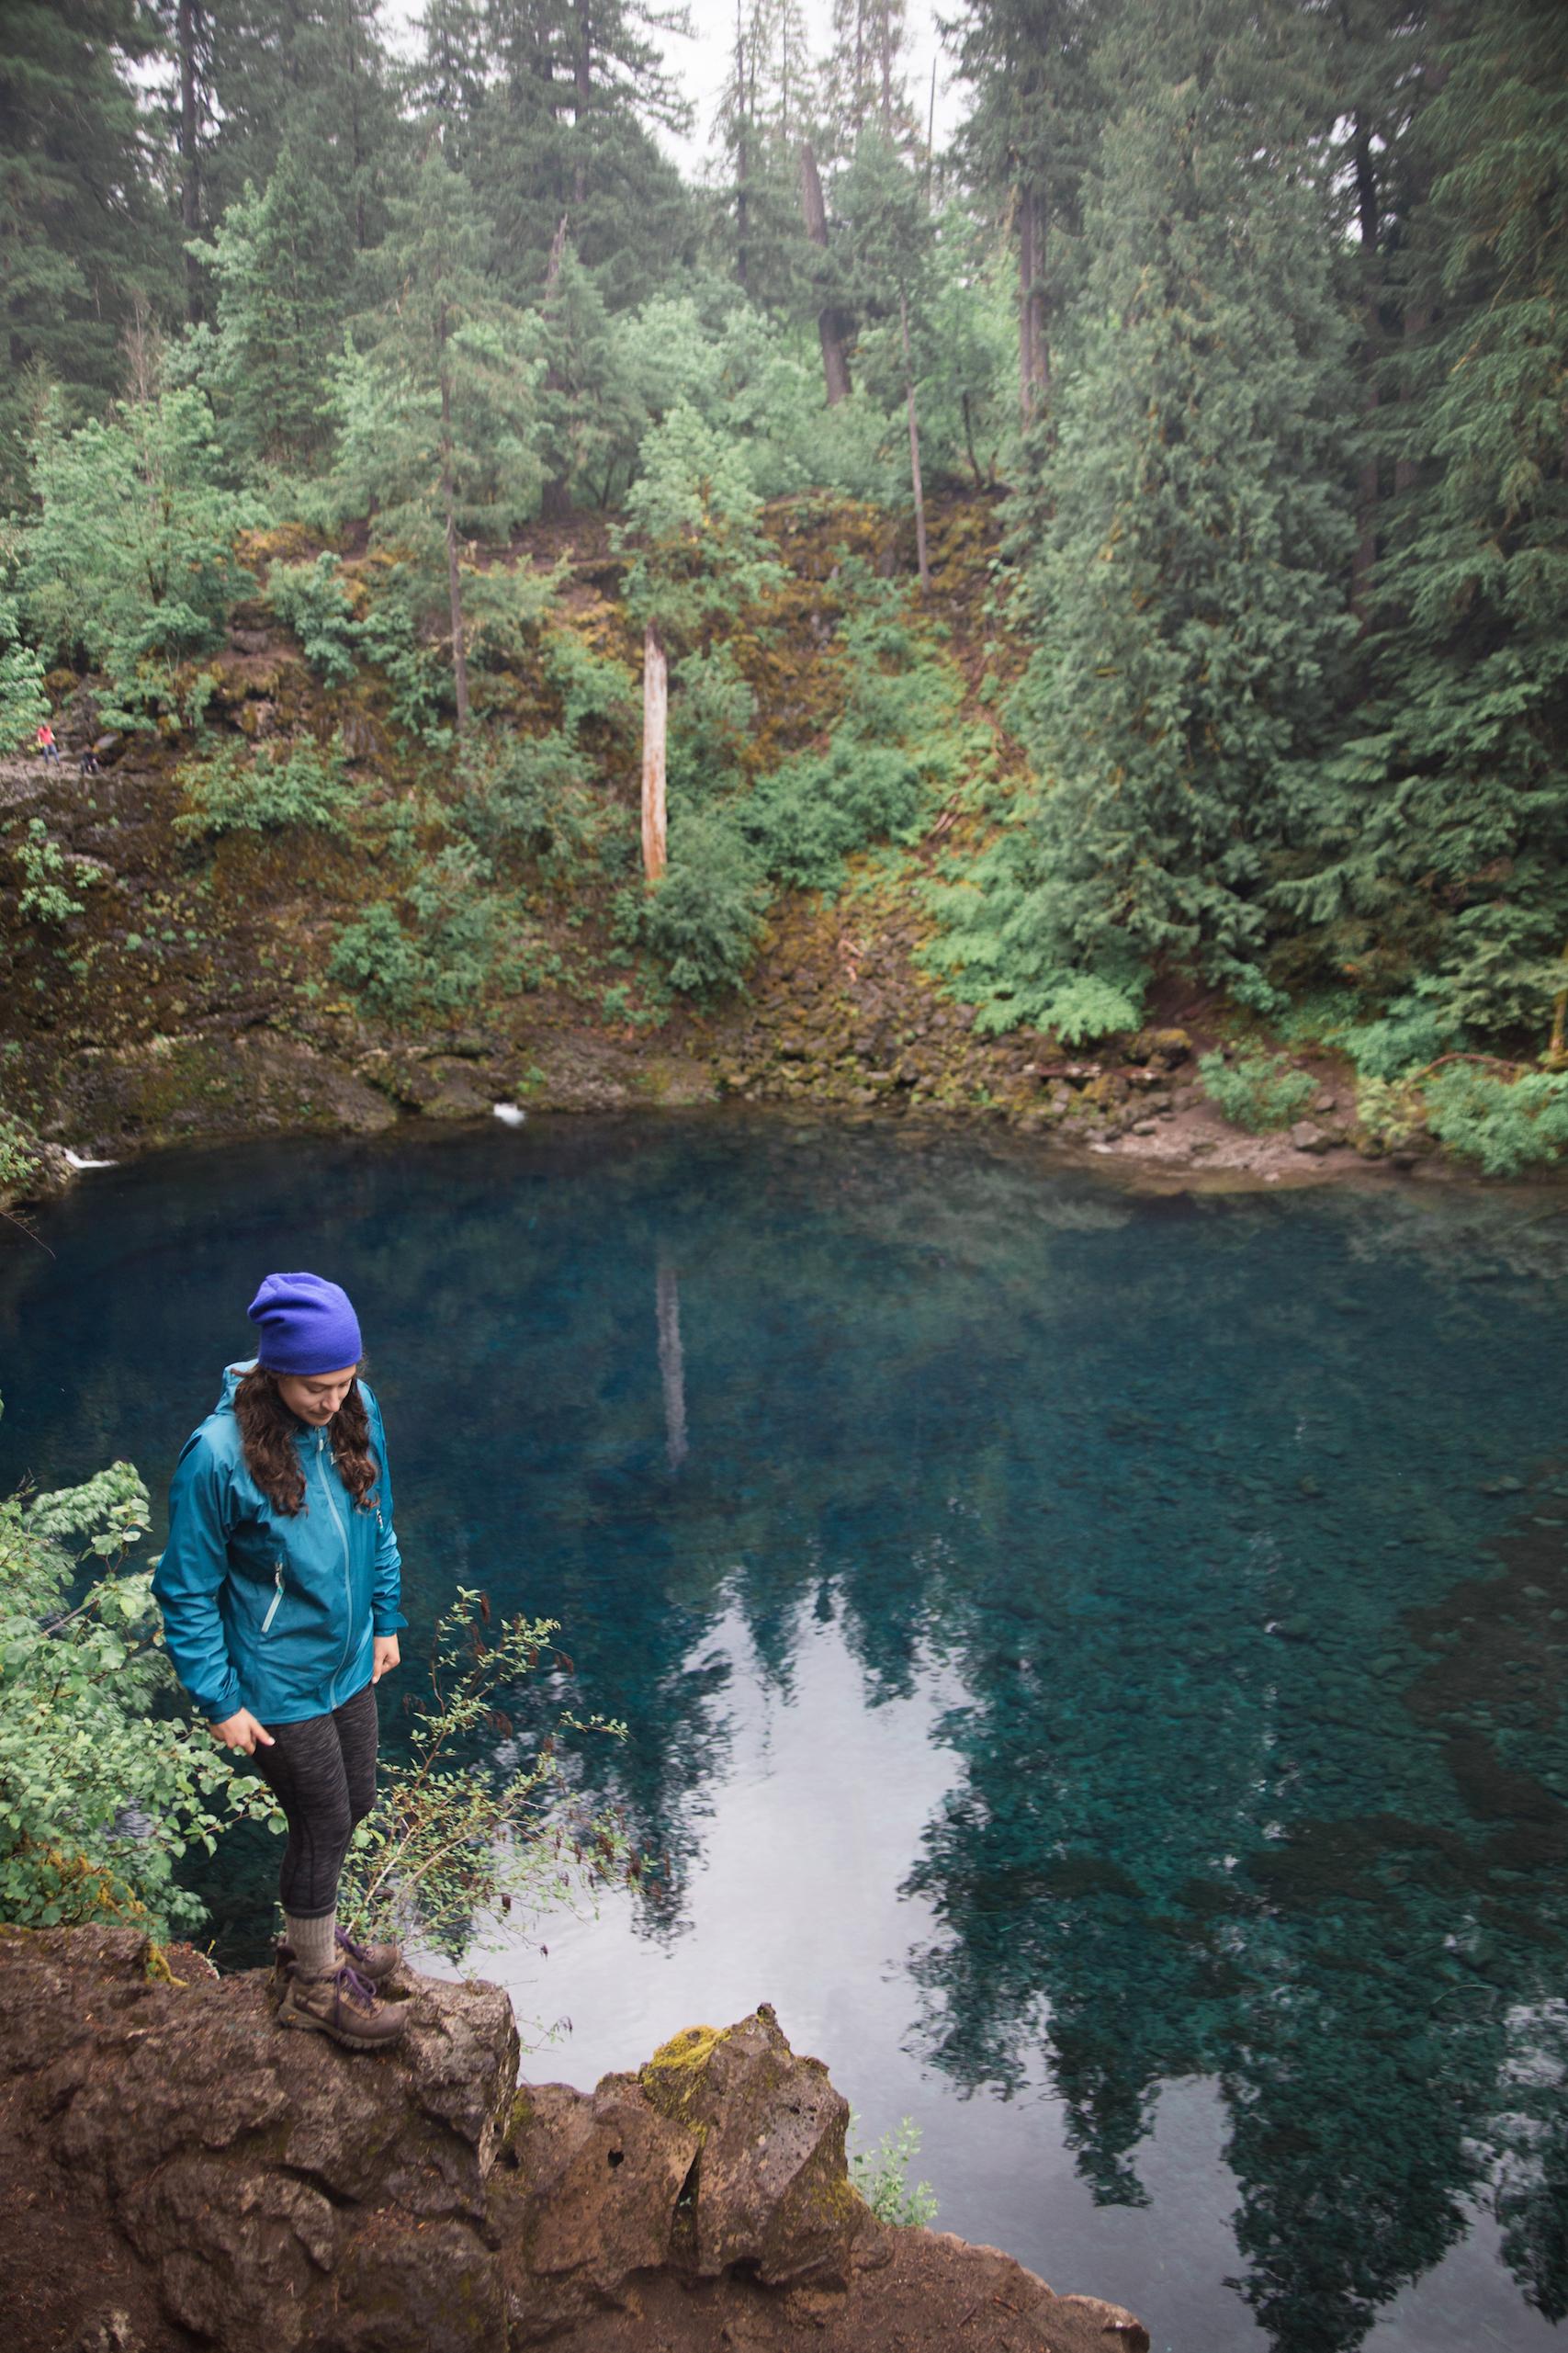 Kelsey at Tamolitch Blue Pool in Oregon